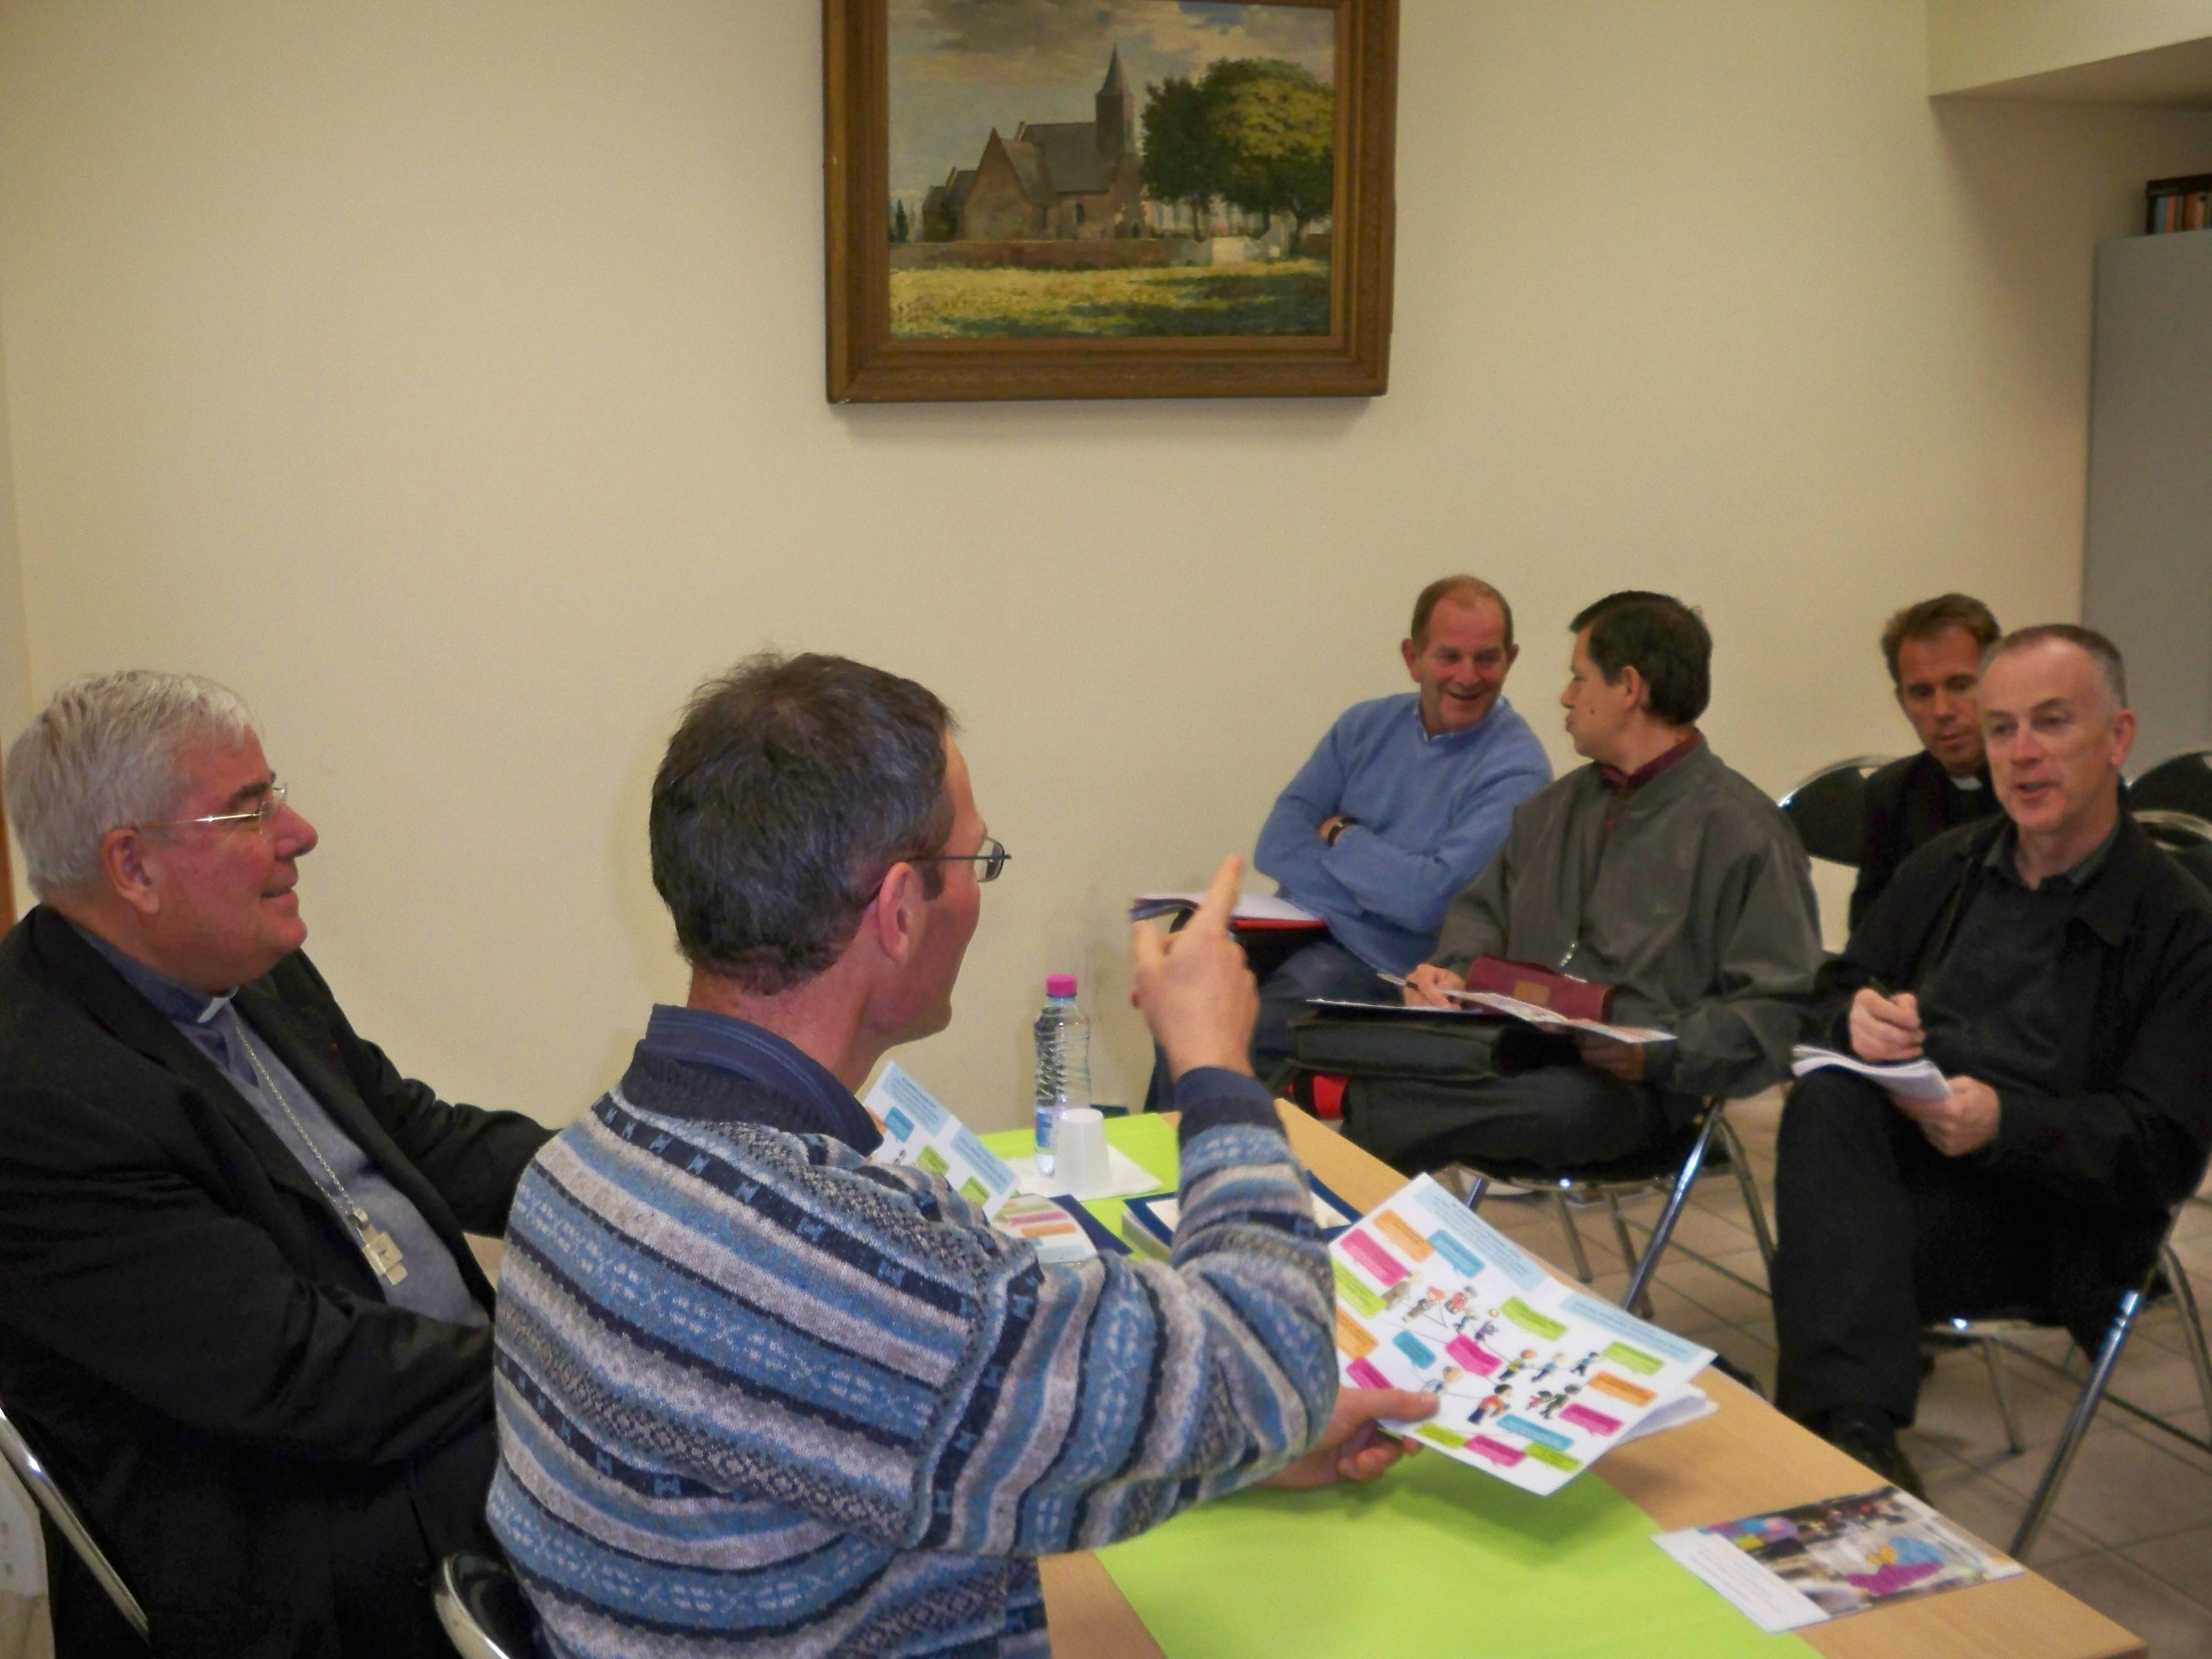 visite pastorale 1er jour 012